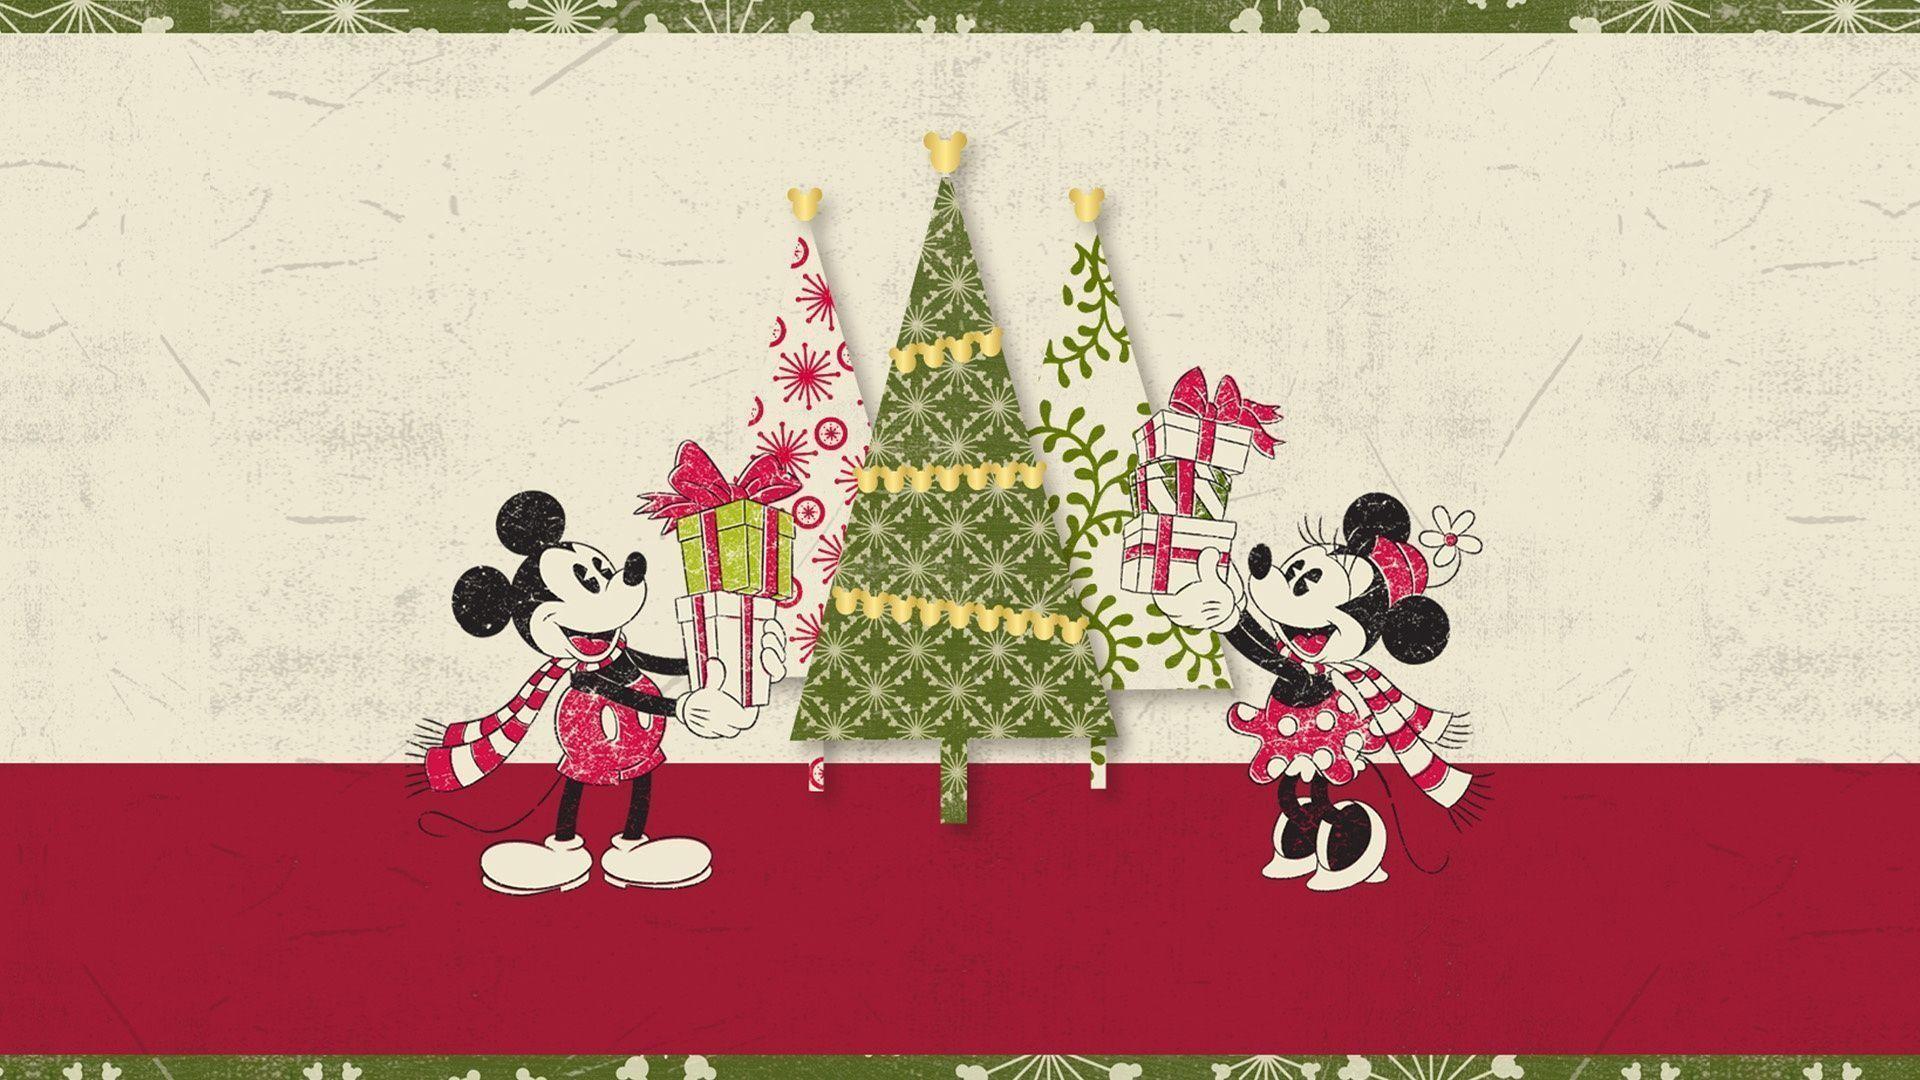 Wallpaperwiki Disney Christmas Wallpapers HD Desktop PIC